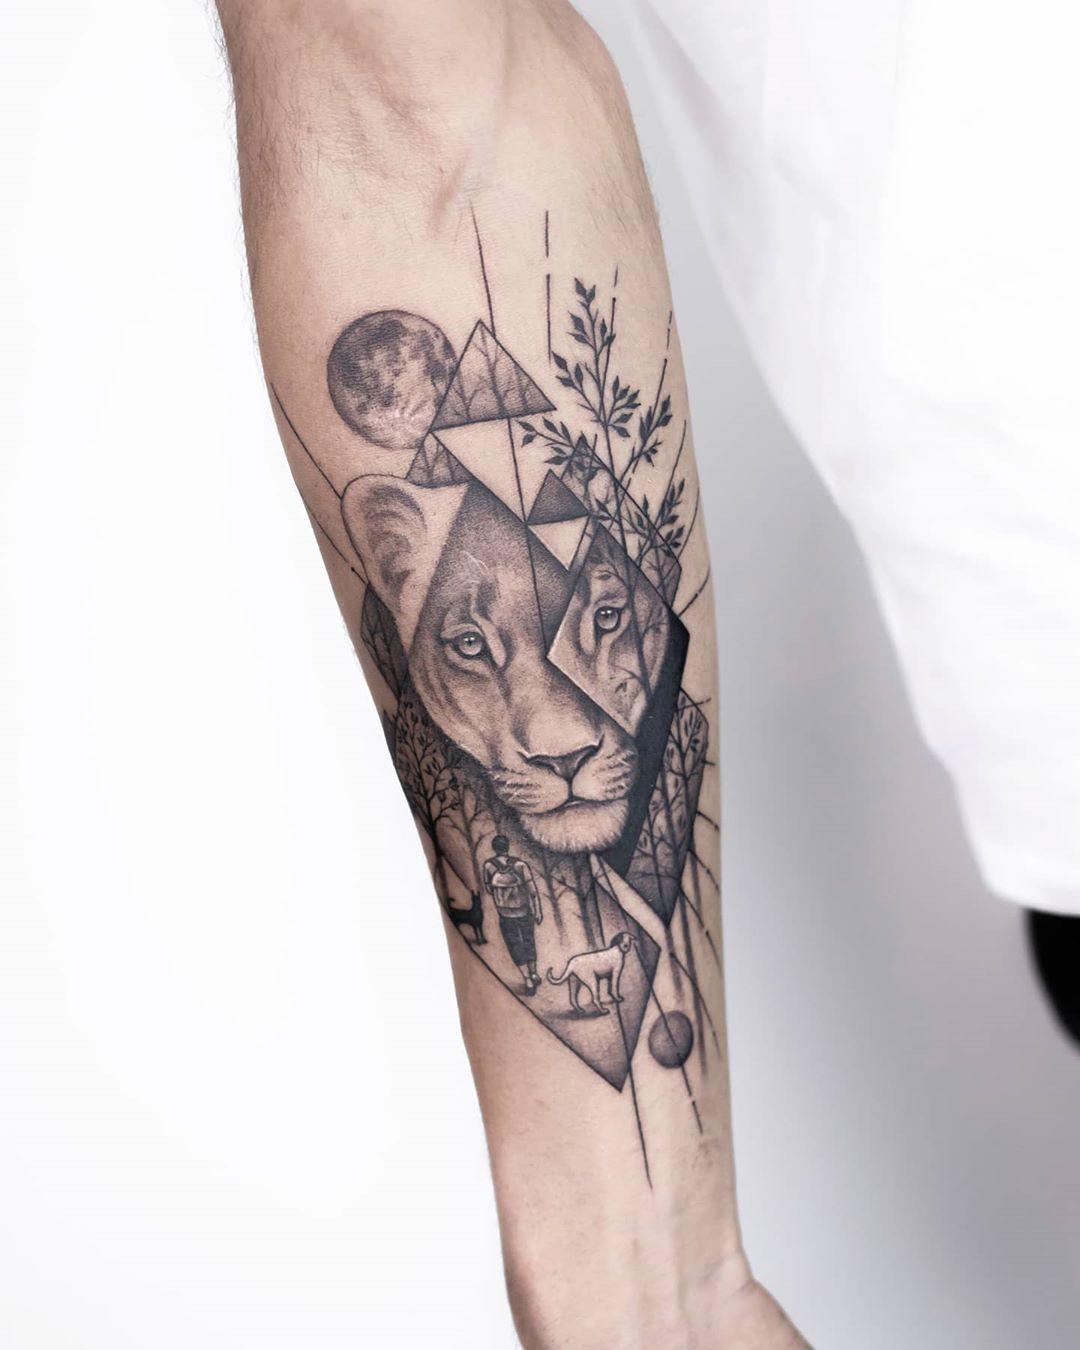 We Love Big Cats 😍 🐈 Wanna see more?!? Follow Us. Done By @lyuba_cuba  #israeltattoo #tattoo #tattoos #tattooist #tattooart #tattooartist #The_inkmasrers #tattoo #tattoomaster #tattoomasters #art #tlv #inkmebaby #inkmebabytattoo #tattoocollective #tattooartist  #tattooartistmagazine #inked  #blacktattooart #owltattoo #telavivtattoo #telavivtattoos